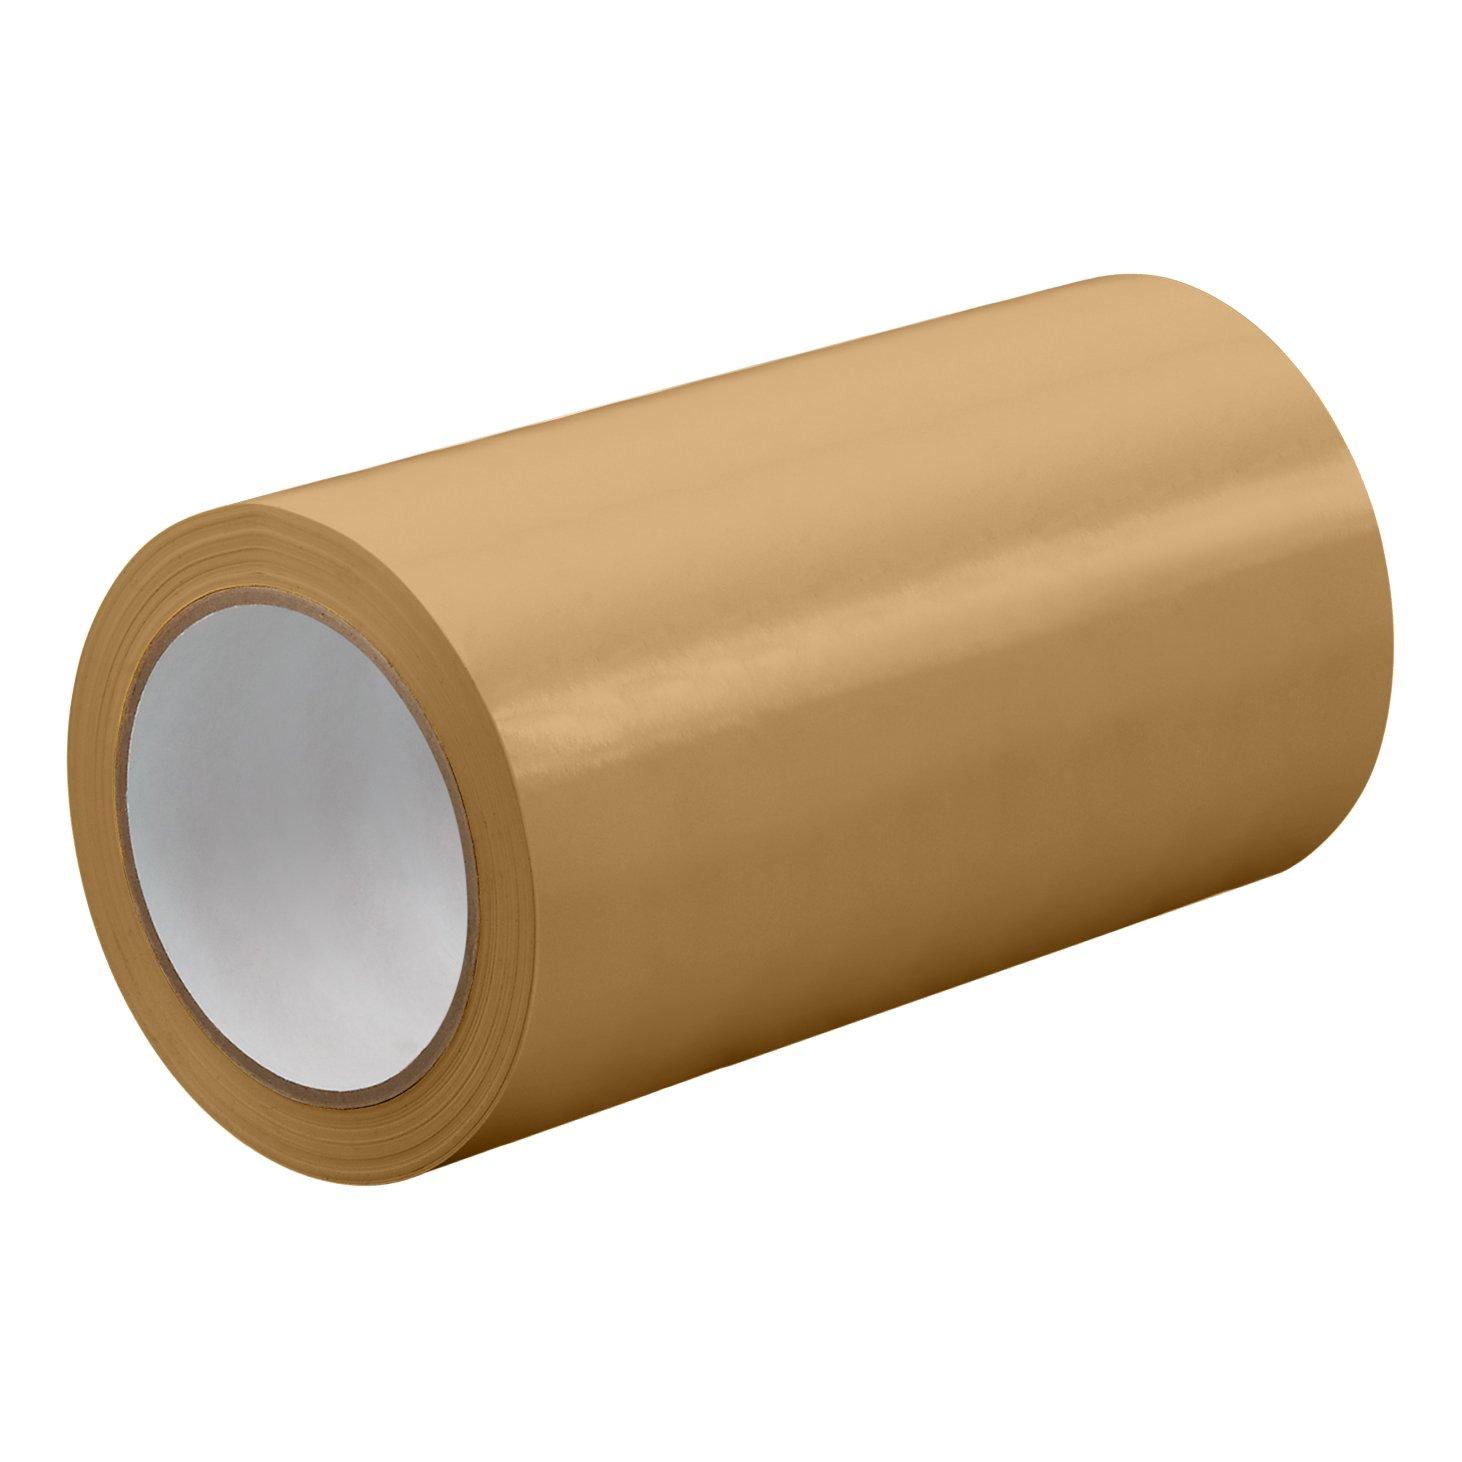 TapeCase TC414-0.125' X 72YD - ORANGE Orange UPVC/Rubber Adhesive Film Tape, 0.0023' Thick, 72 yd. Length, 0.125' Width, 1 Roll 0.0023 Thick 0.125 Width TC414-0.125 X 72YD - ORANGE